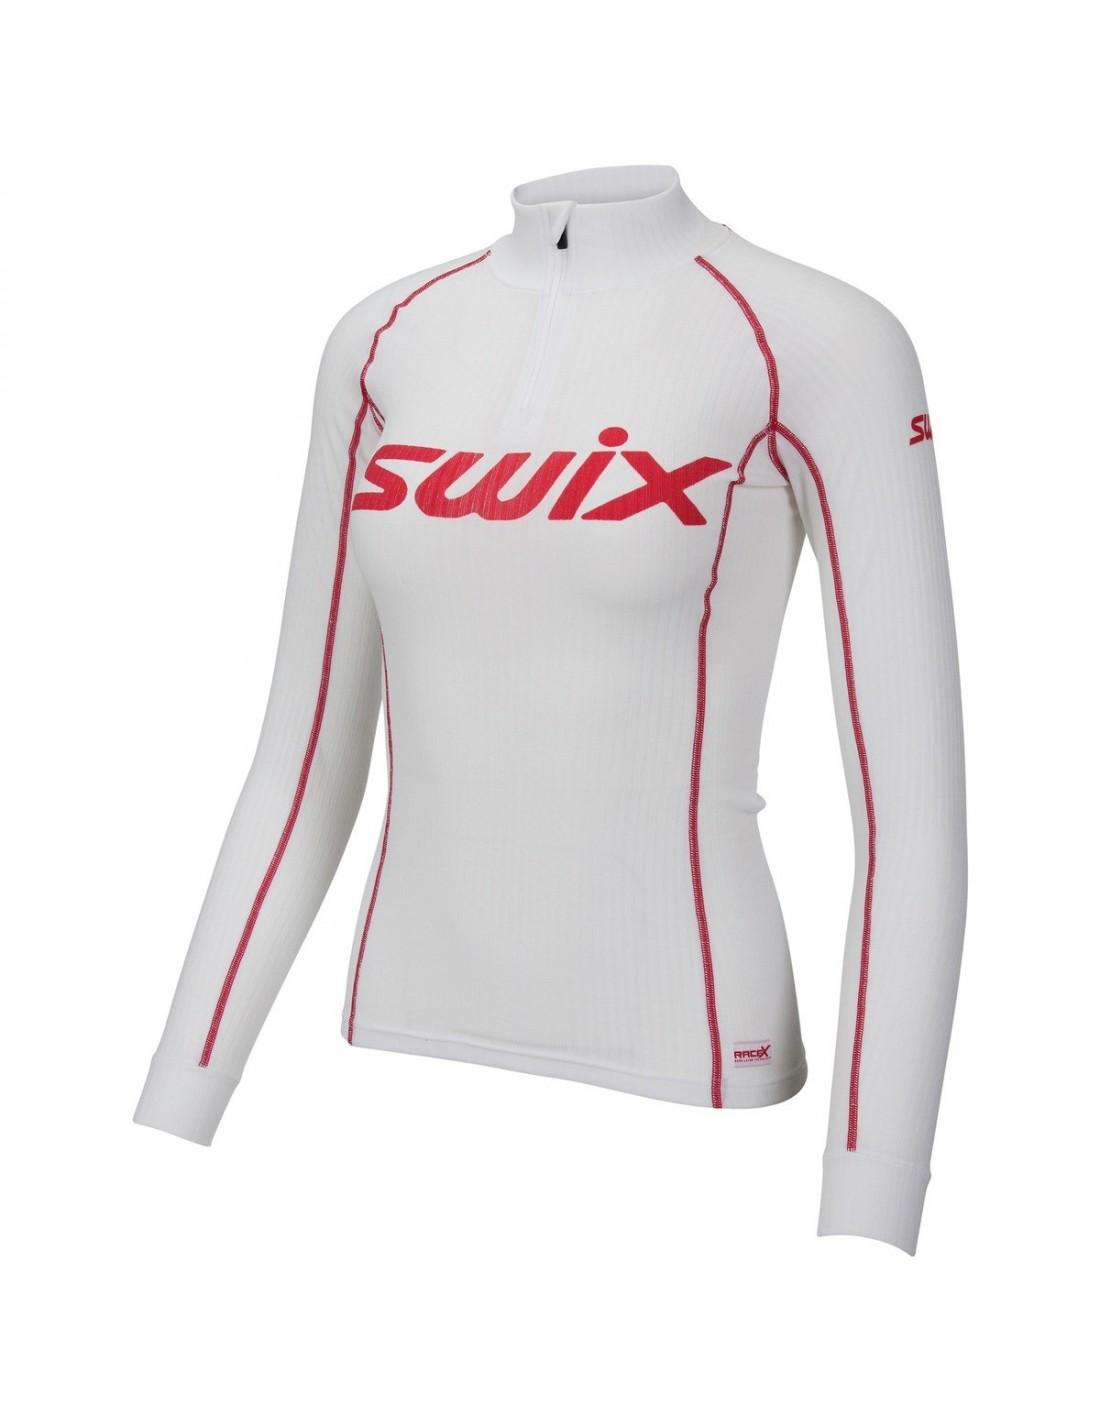 Polyestertrøye till Damer Swix RaceX BodyW HZ Dame 40826 449 kr